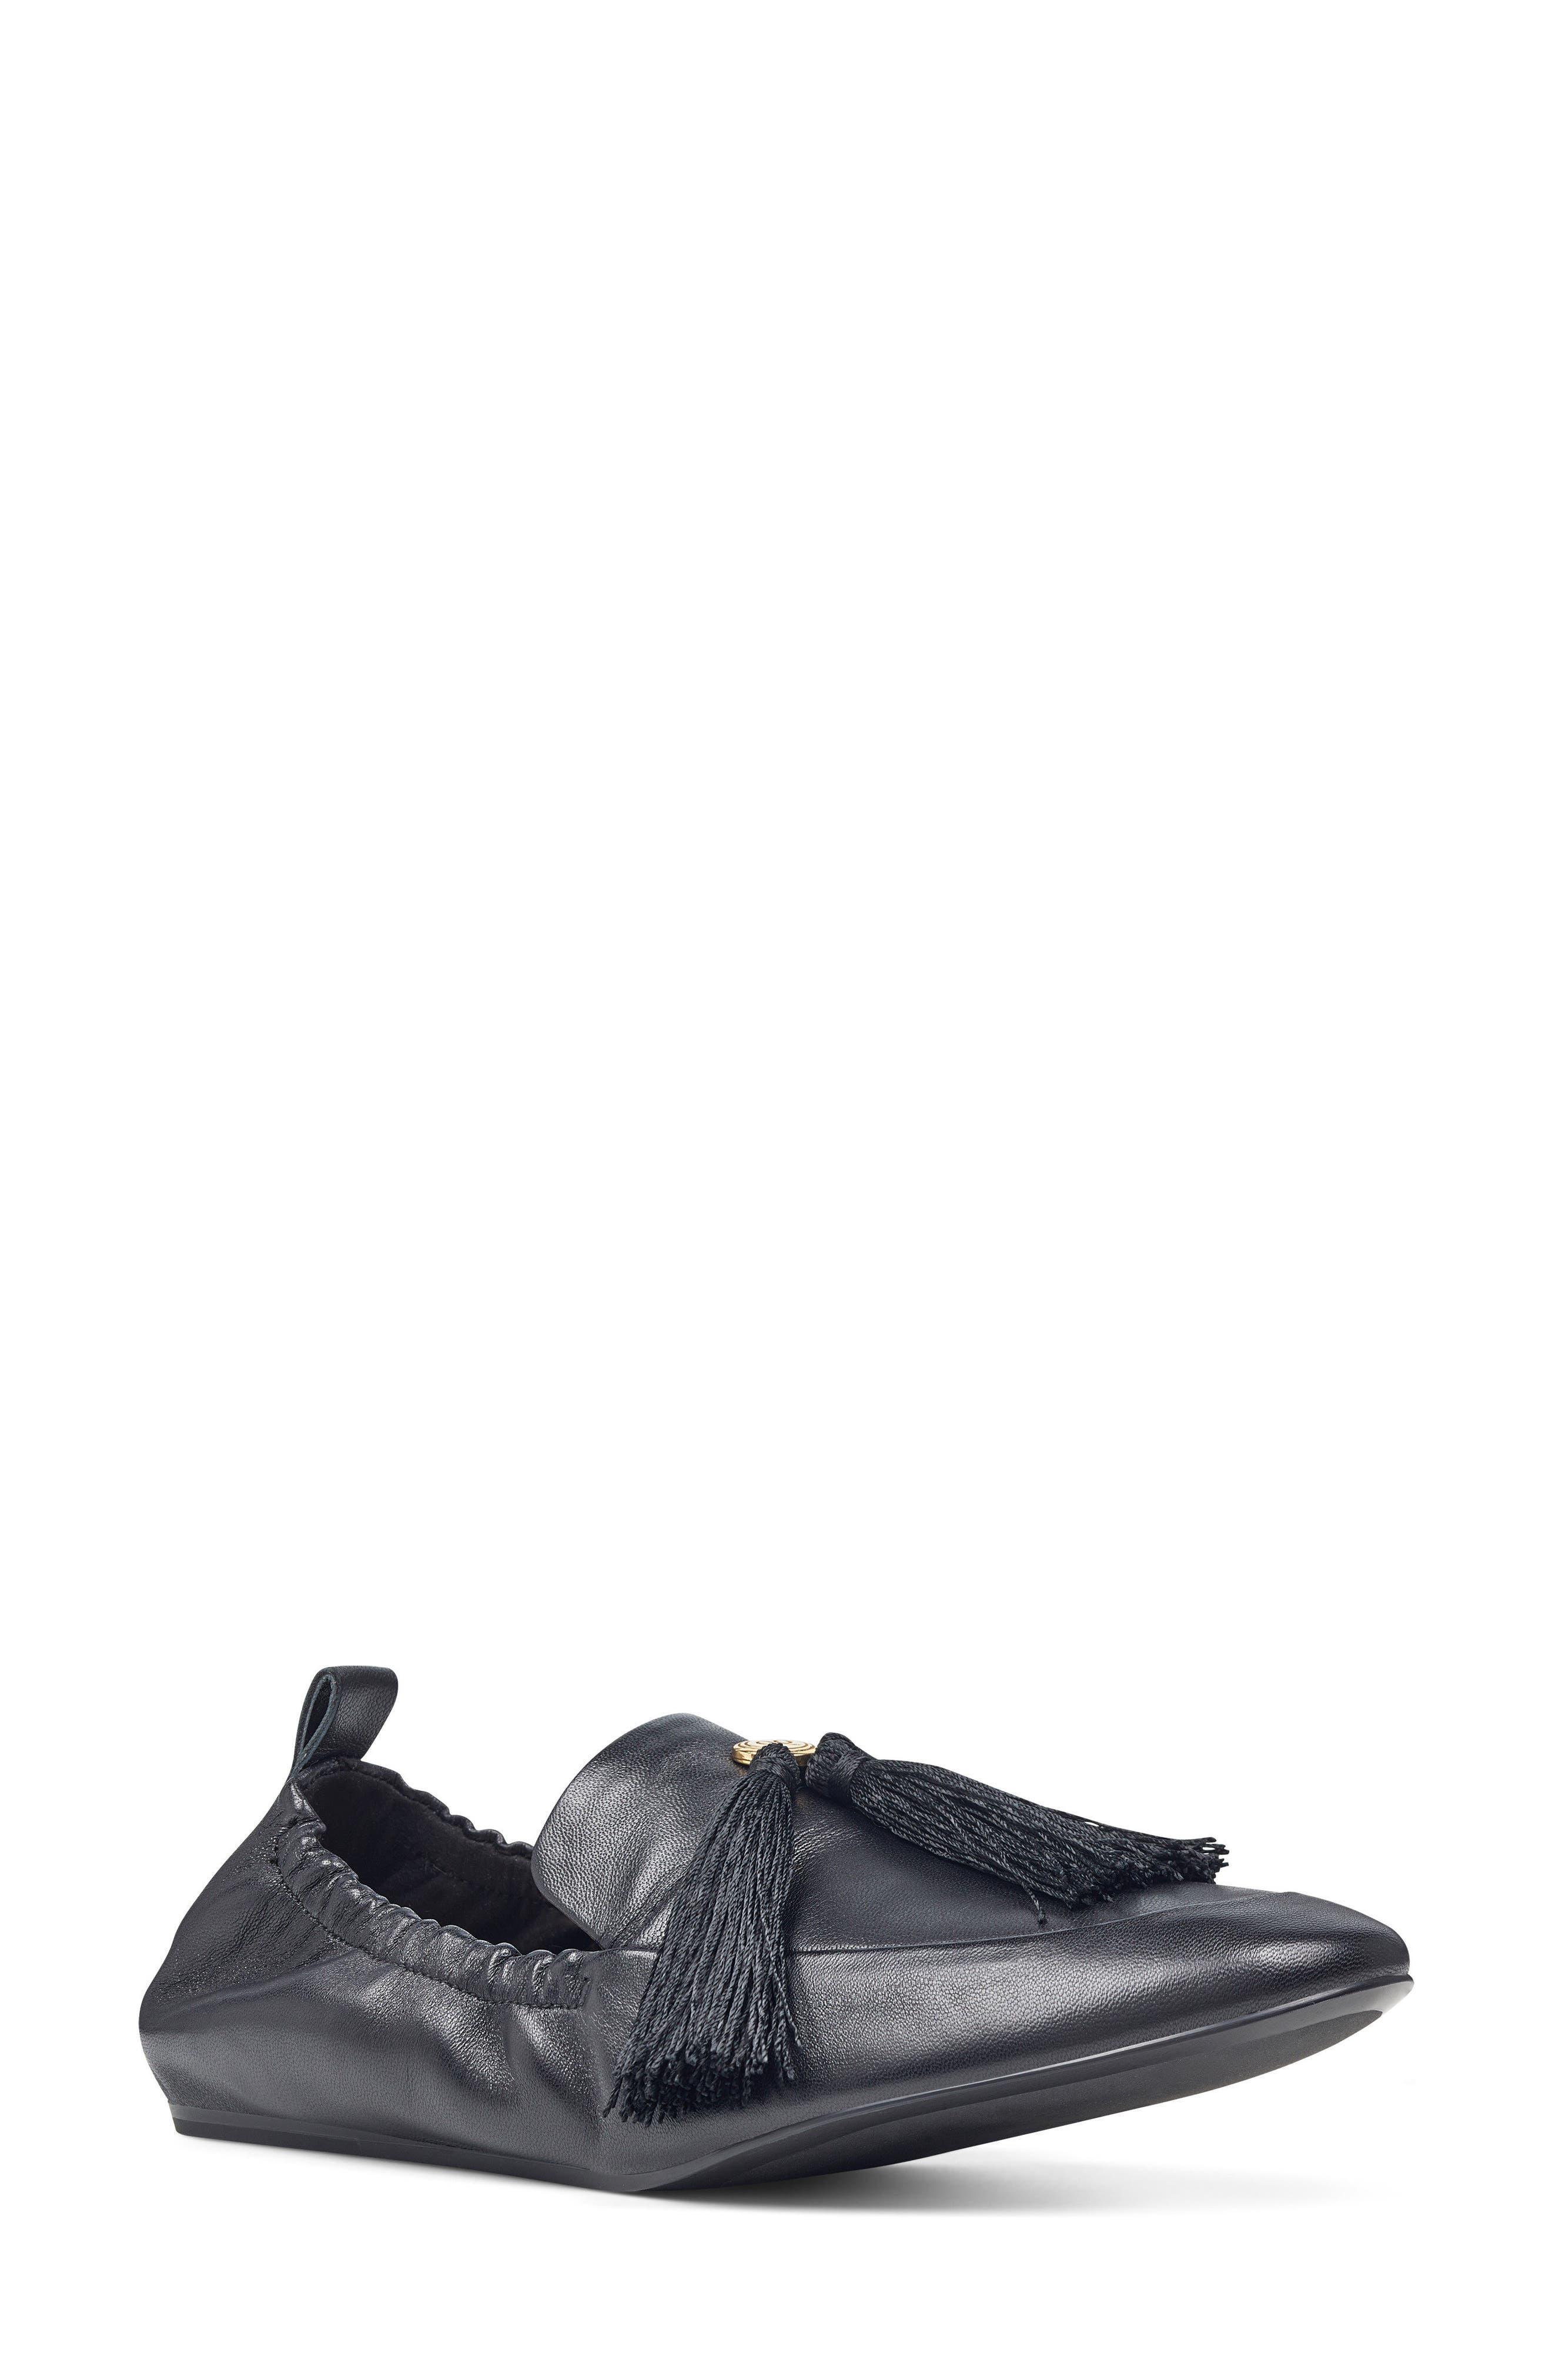 Ballard Tassel Loafer Flat,                         Main,                         color, Black Leather